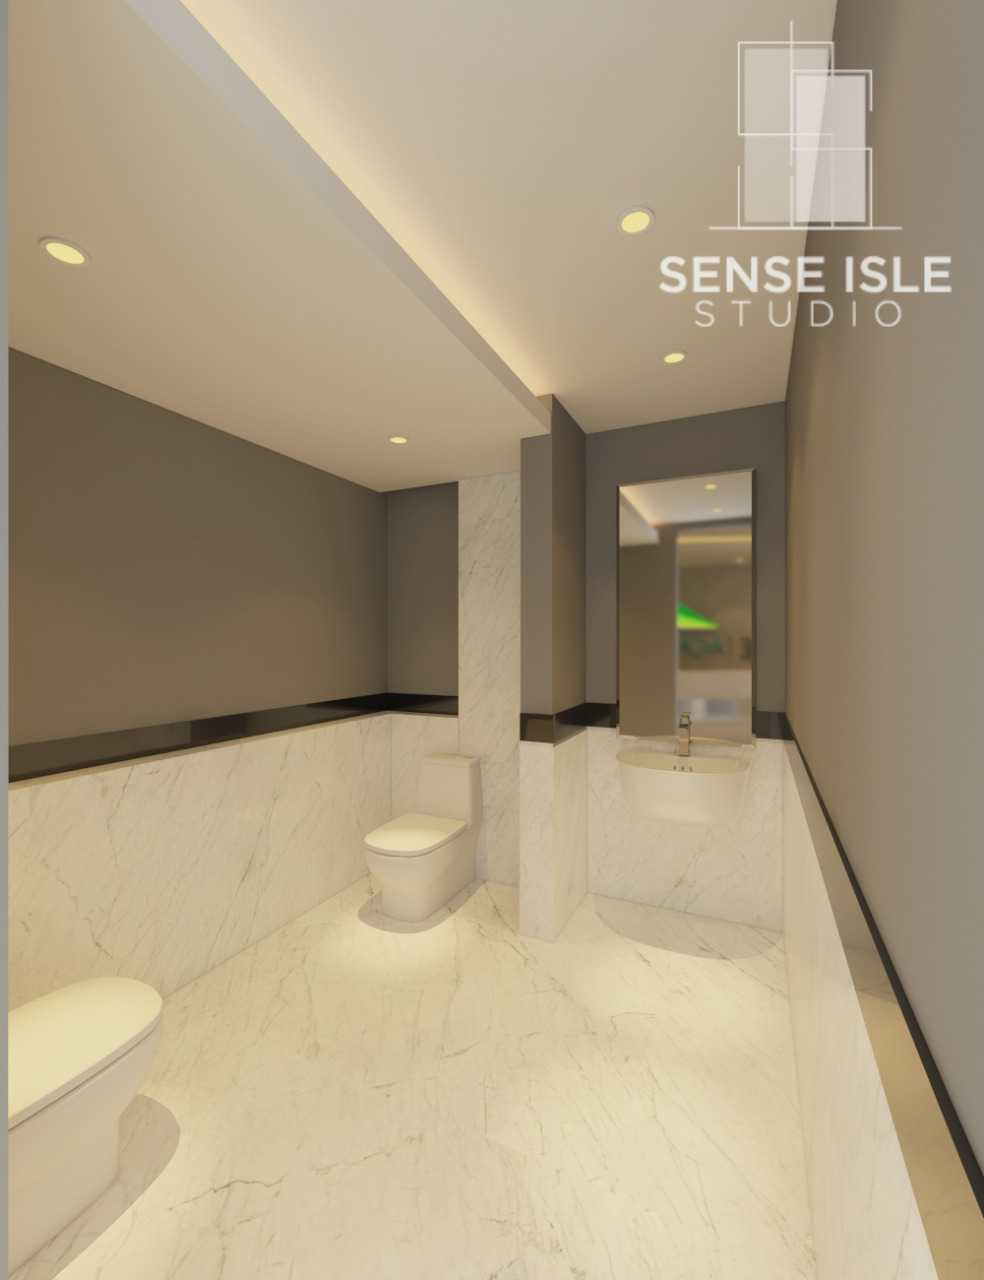 Sense Isle Studio Office Surabaya - Miracle Academy Surabaya Surabaya, Kota Sby, Jawa Timur, Indonesia Surabaya, Kota Sby, Jawa Timur, Indonesia Sense-Isle-Studio-Office-Surabaya   102302